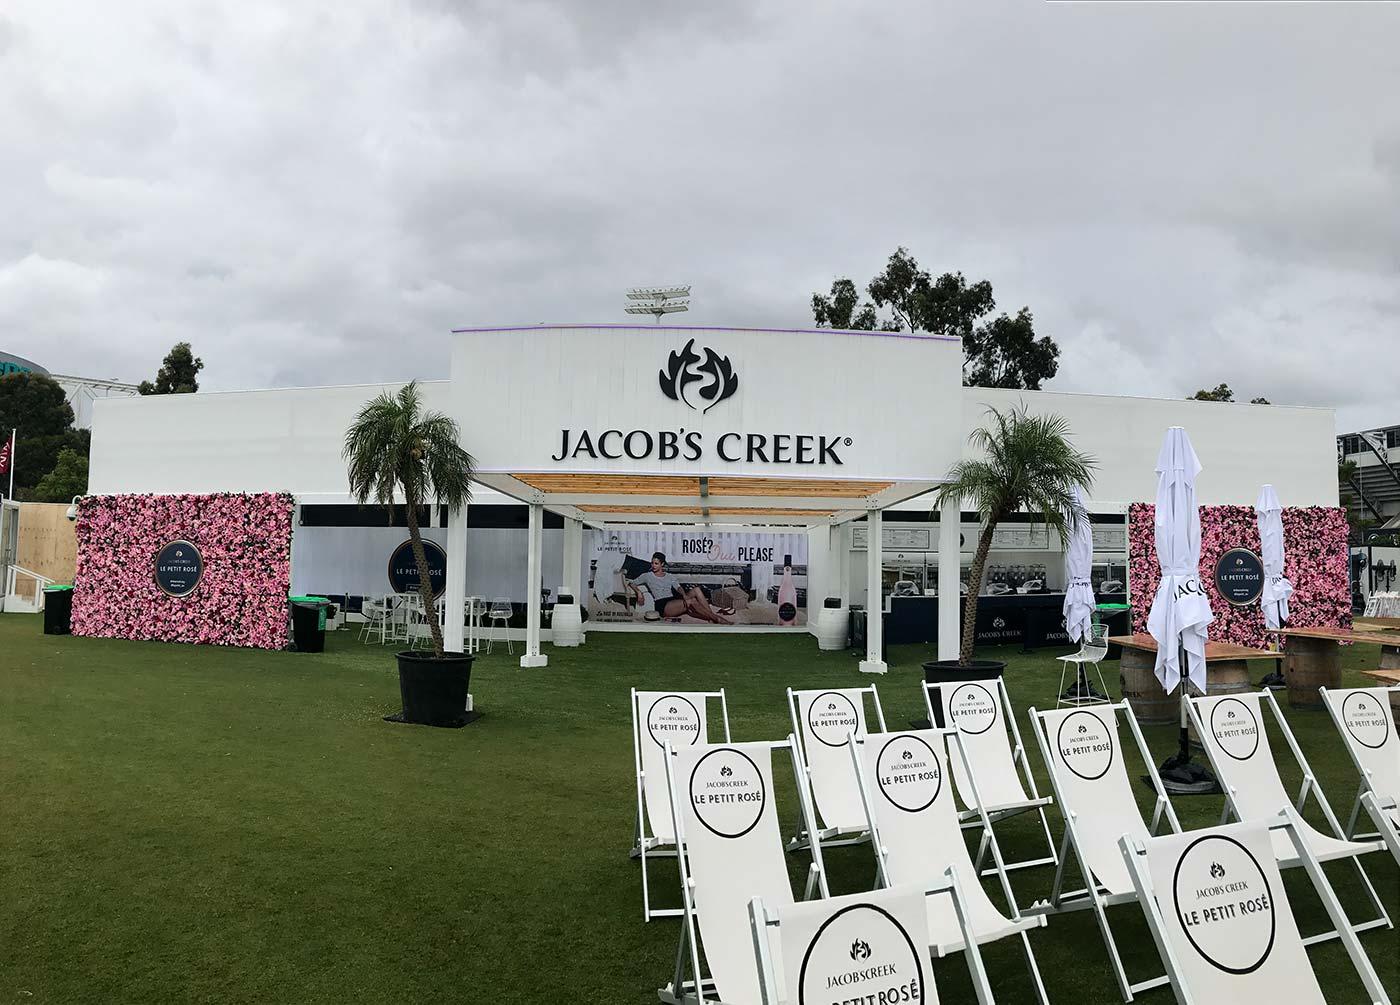 Jacobs-Creek-Activation-7